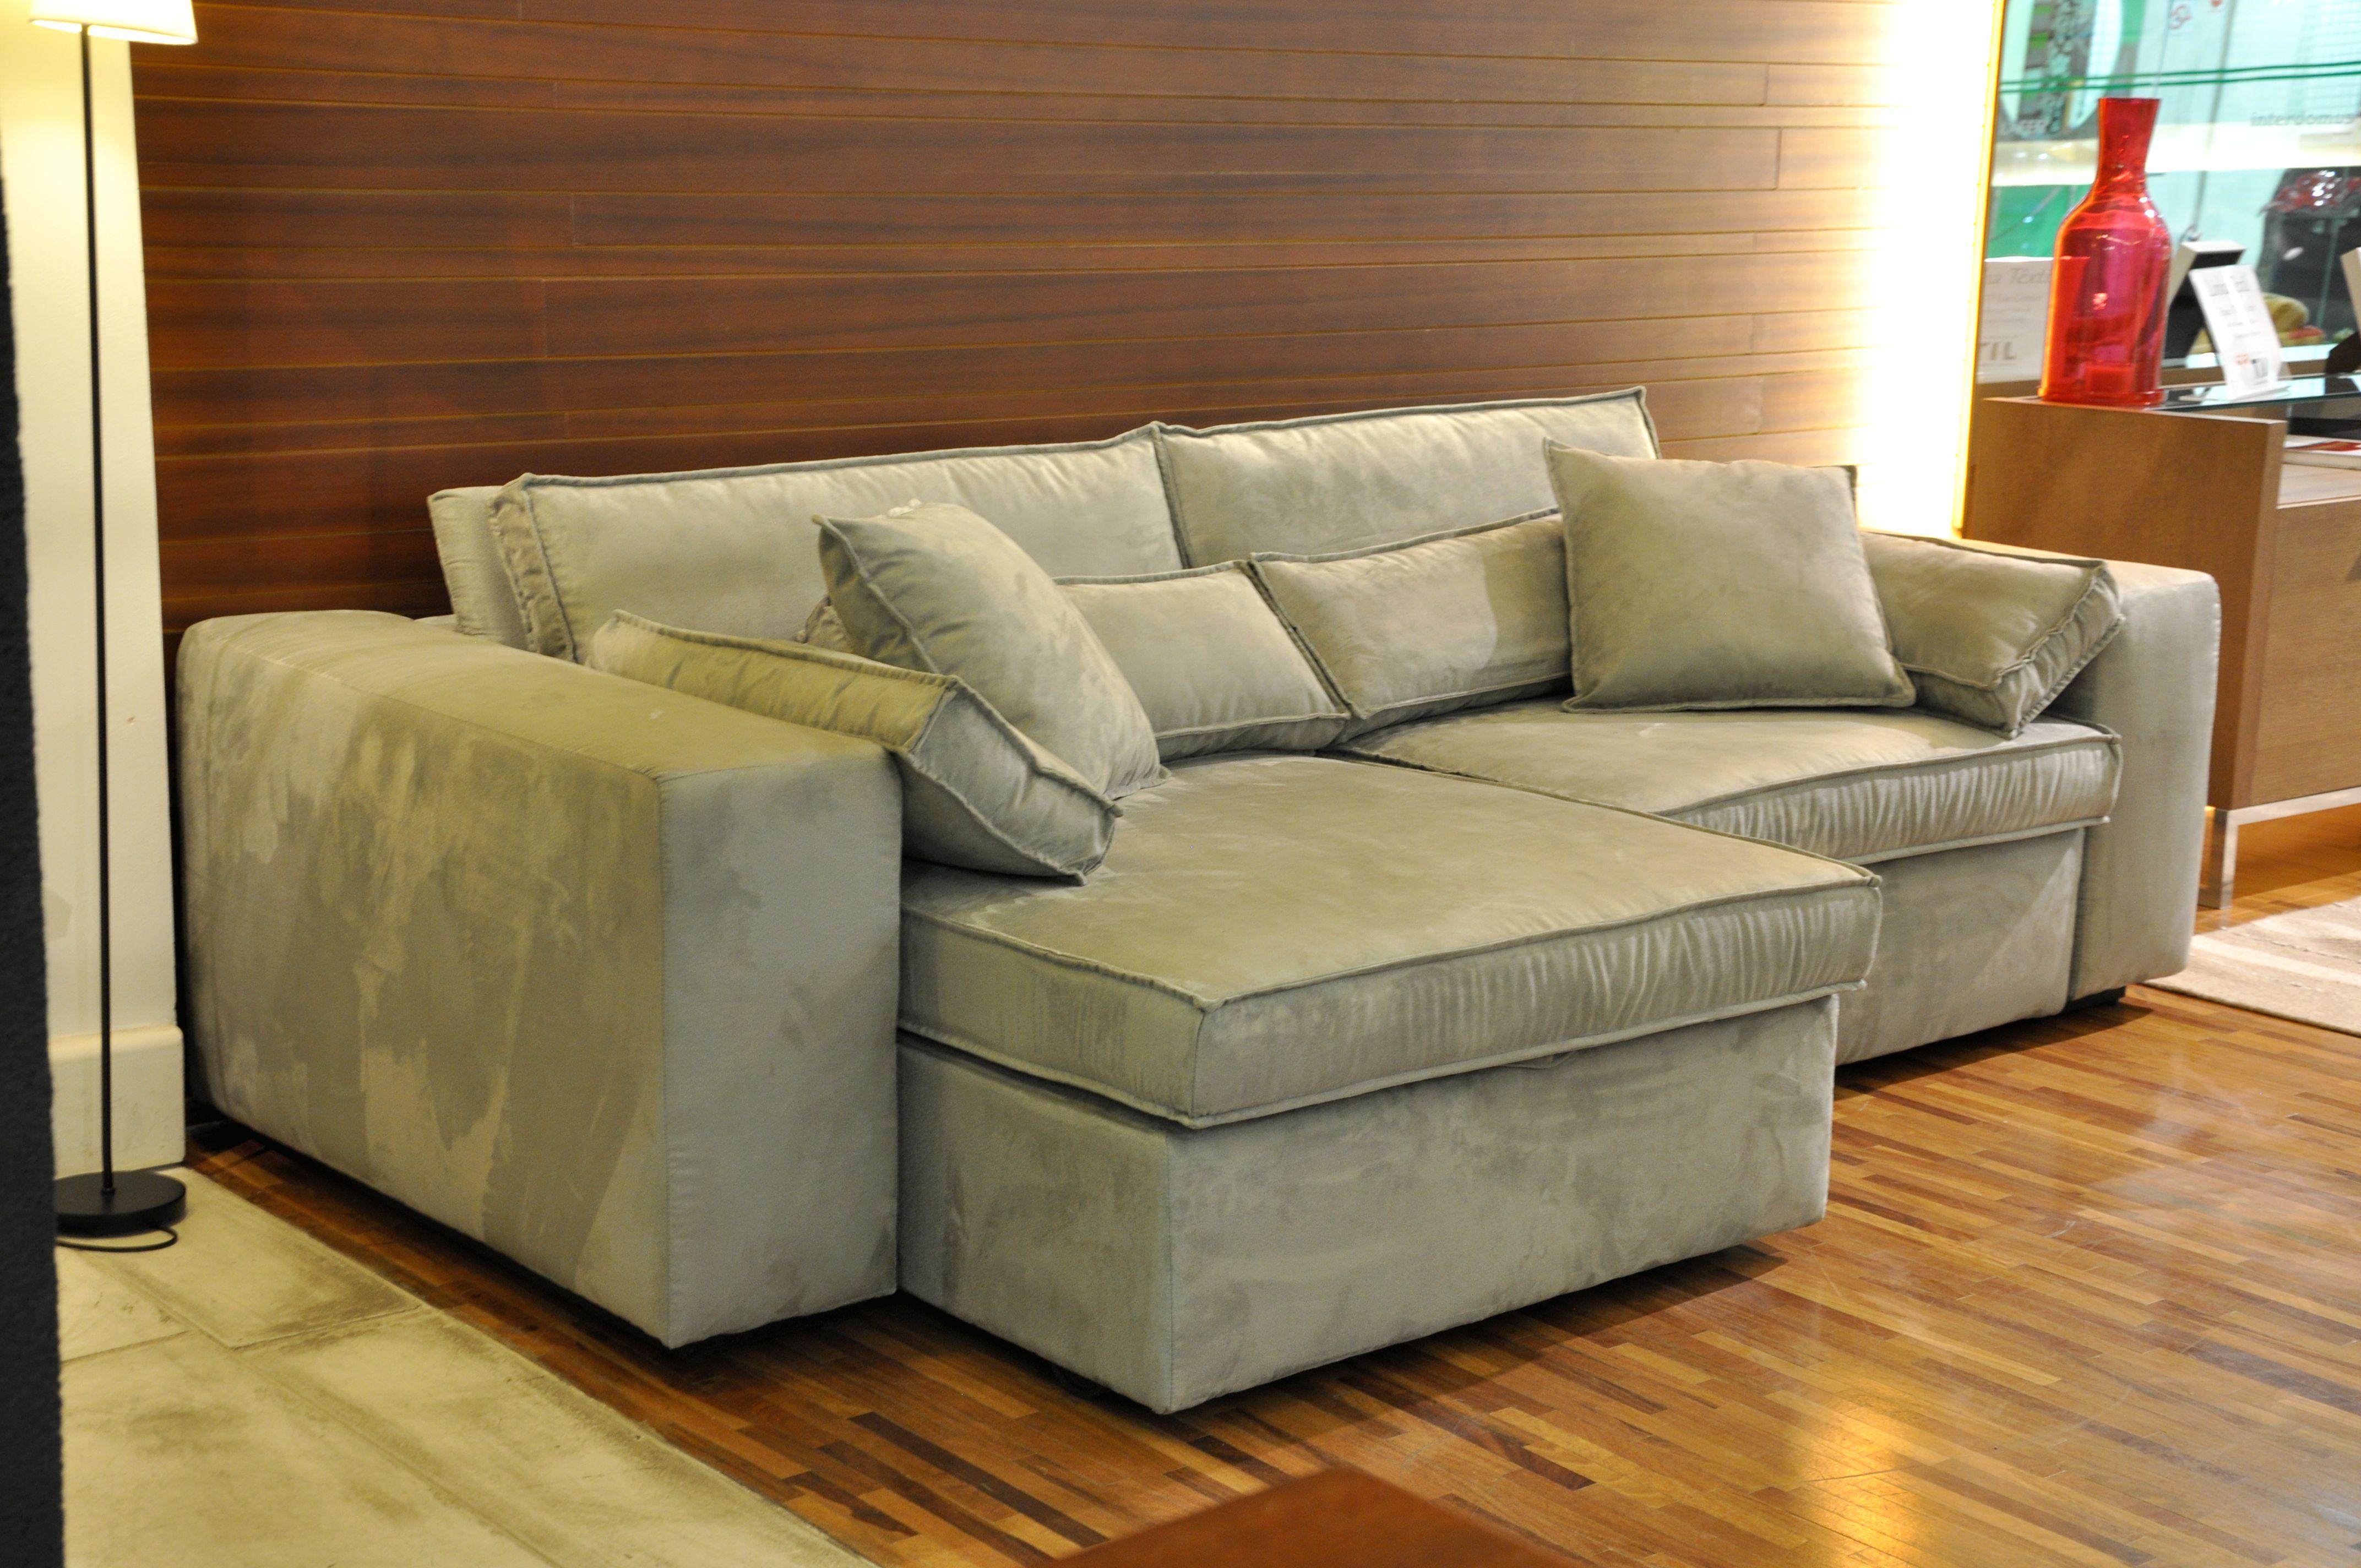 Sofá retrátil para home theater- modelo Lounge http://www ...